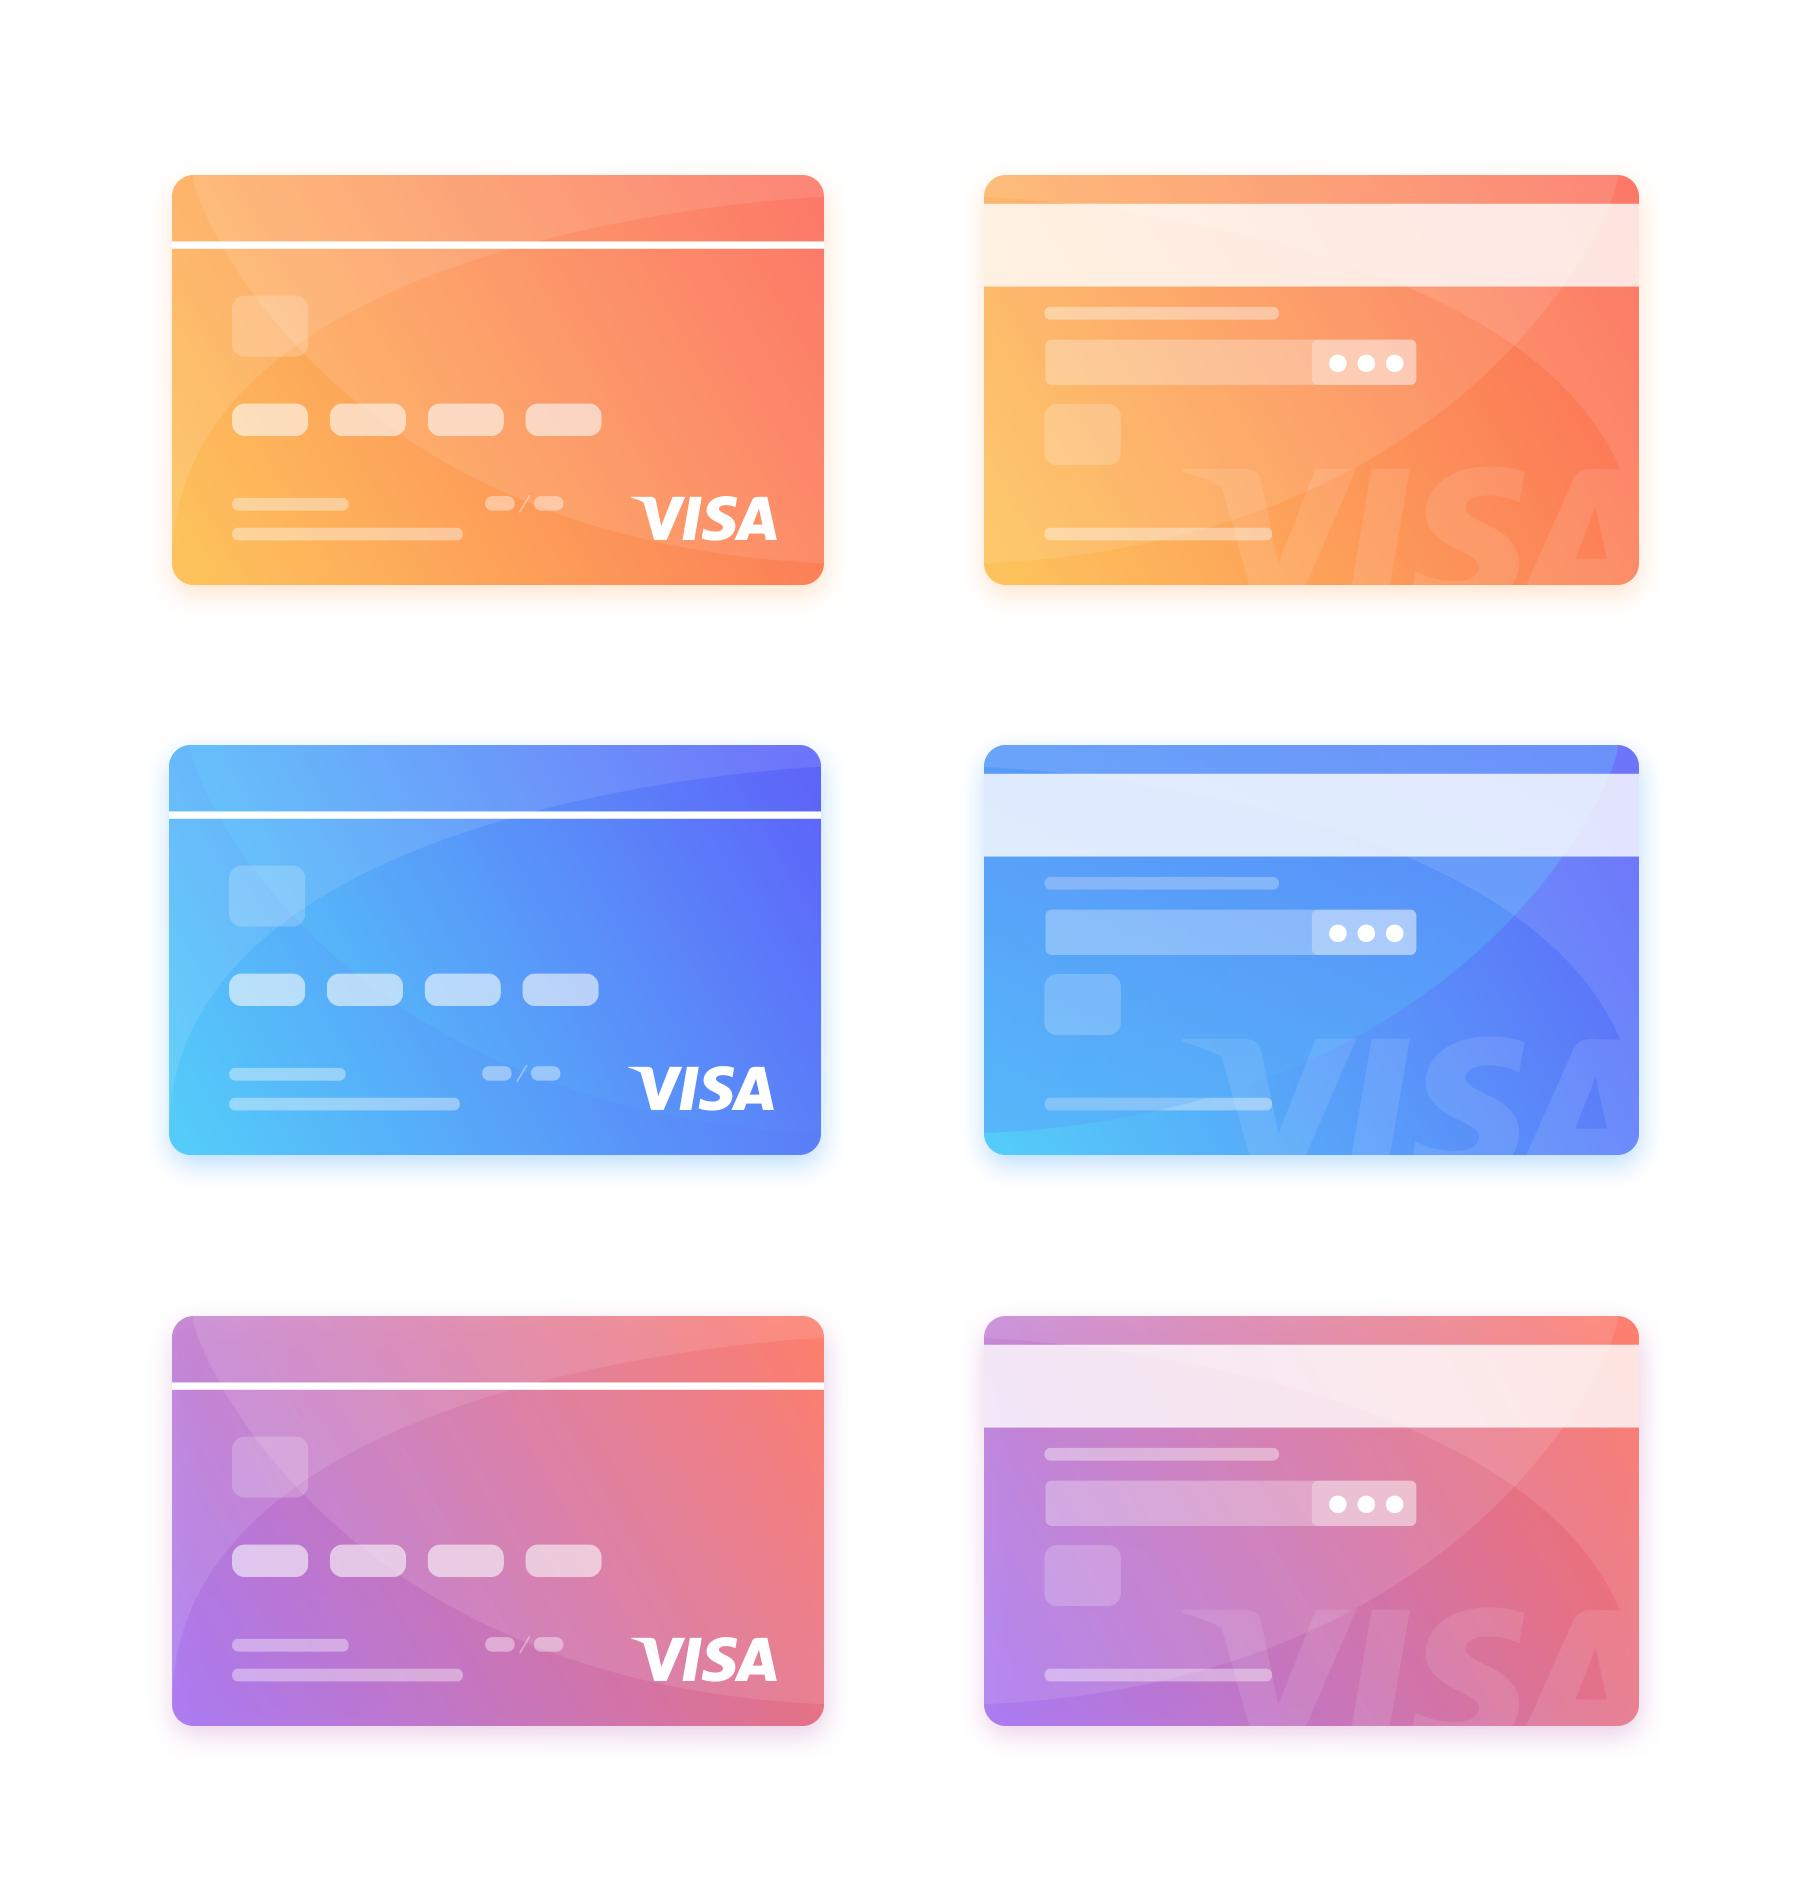 Minimal visacardexploration fhd